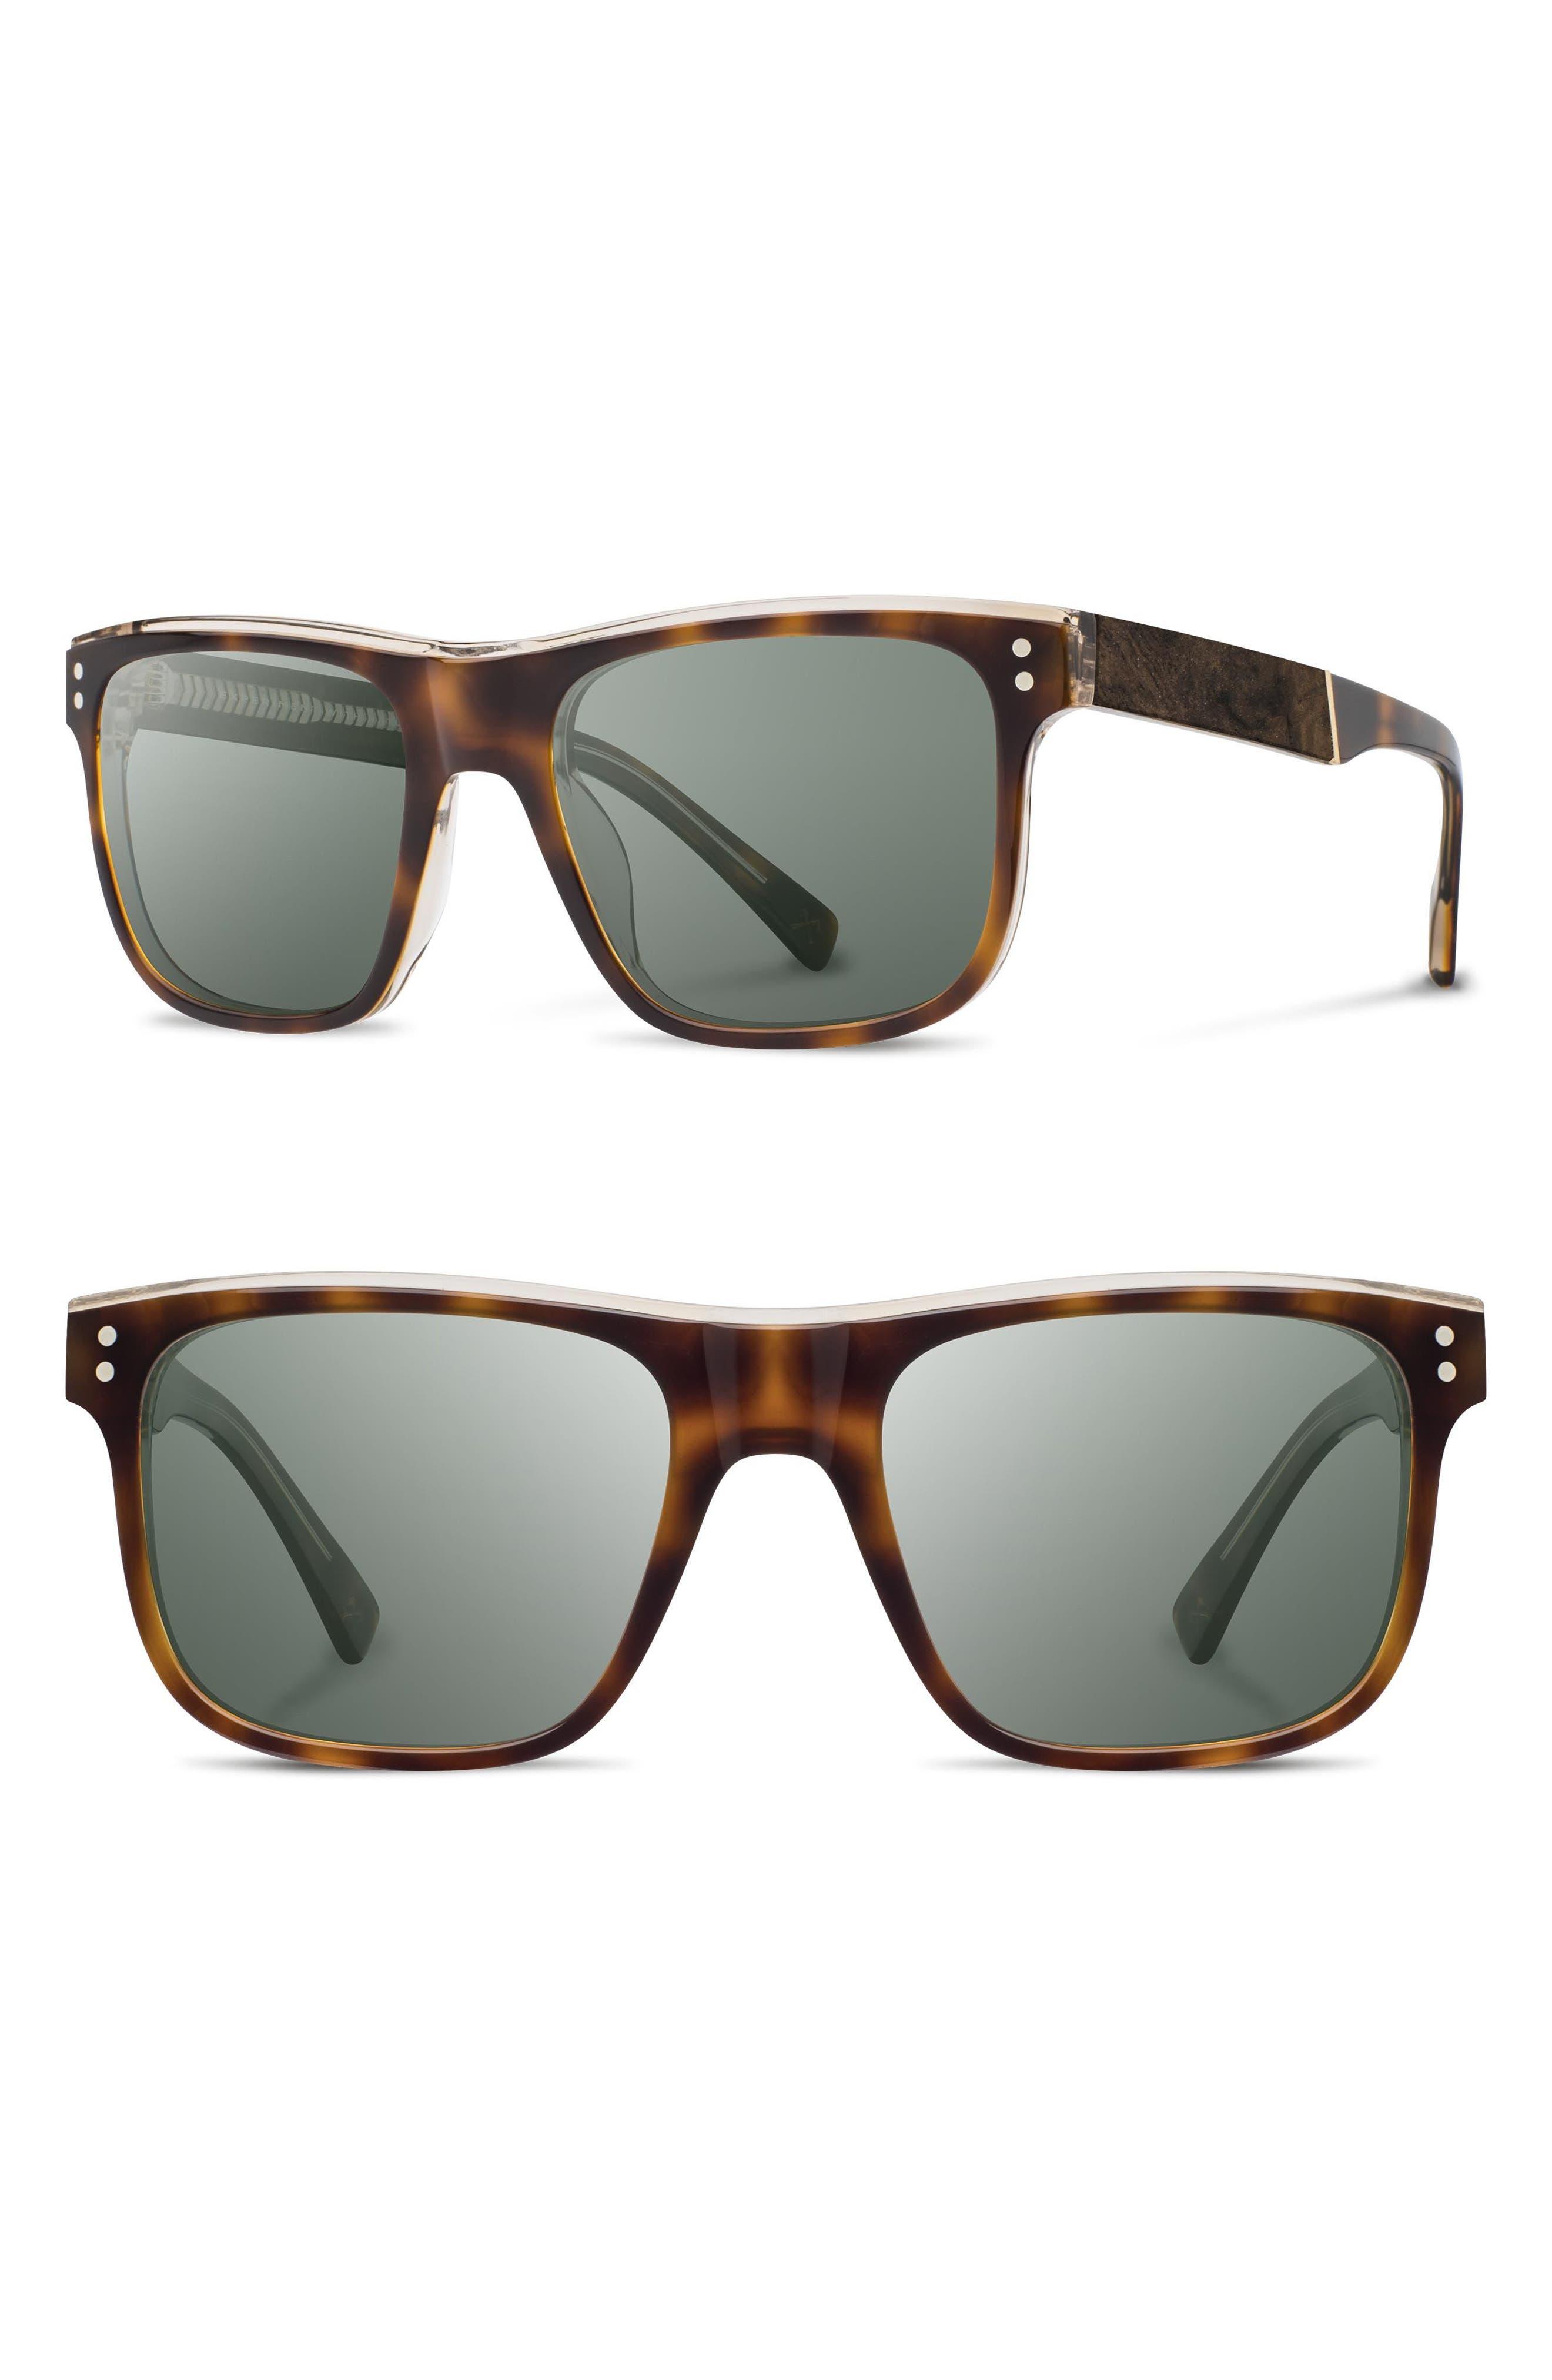 Monroe 55mm Polarized Sunglasses,                             Main thumbnail 1, color,                             BRINDLE/ ELM/ G15POL